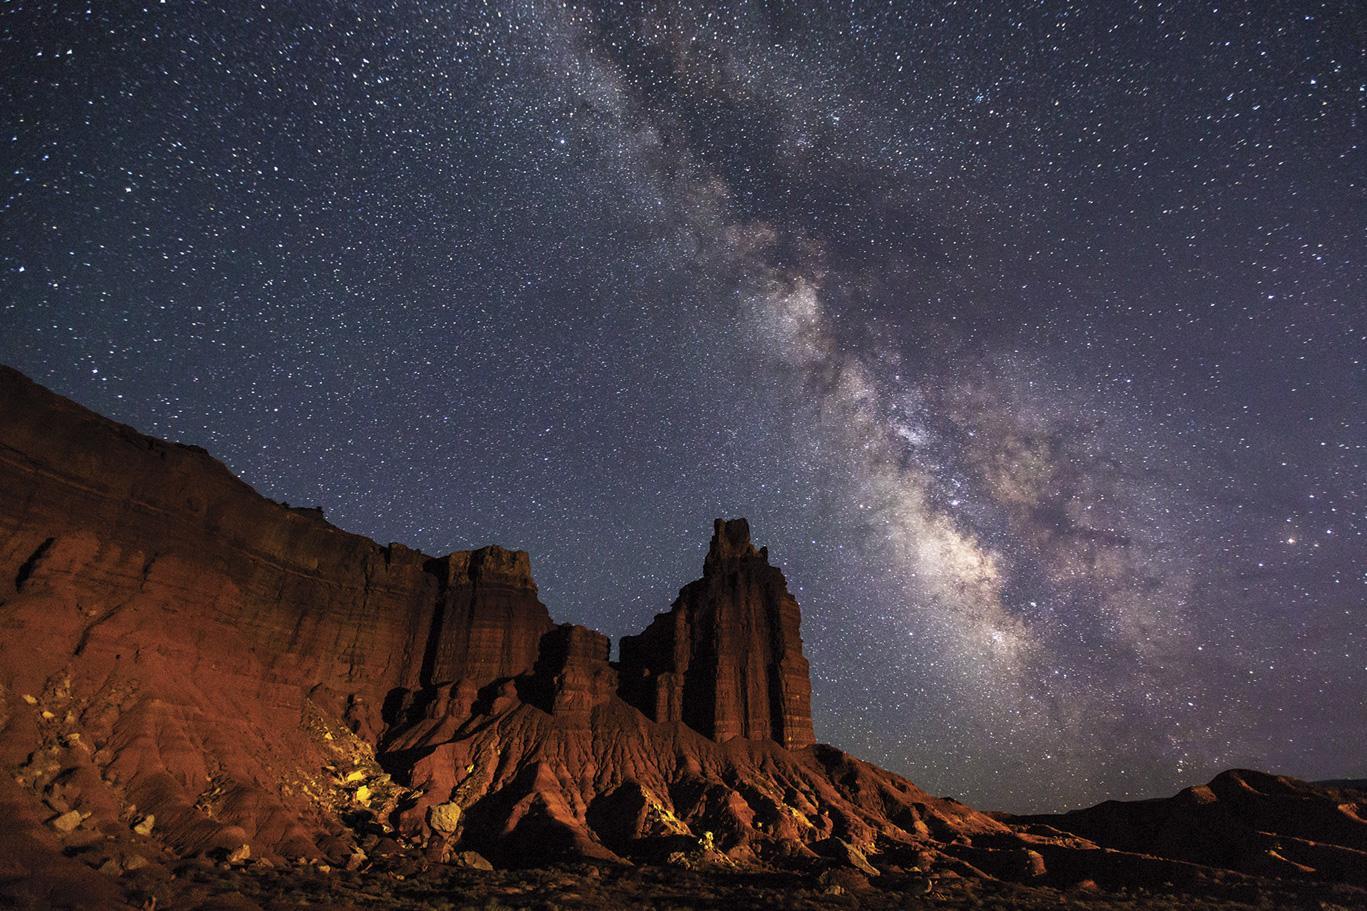 Capitol Reef National Park, Utah, 2015, an International Dark Sky Park